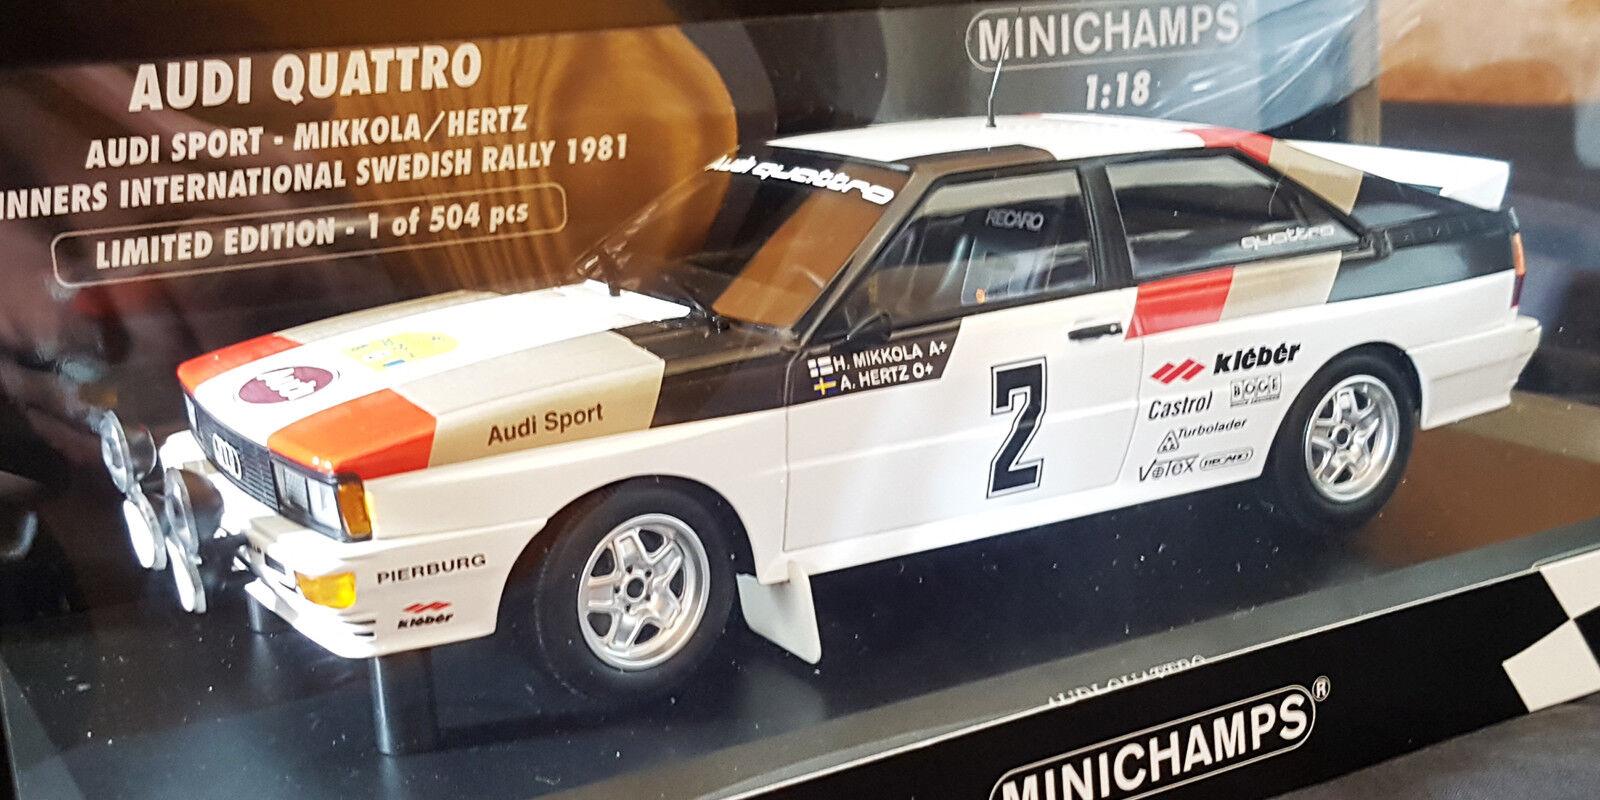 Minichamps, AUDI QUATTRO, Mikkola-Hertz, Swedish Rally'81, 1:18